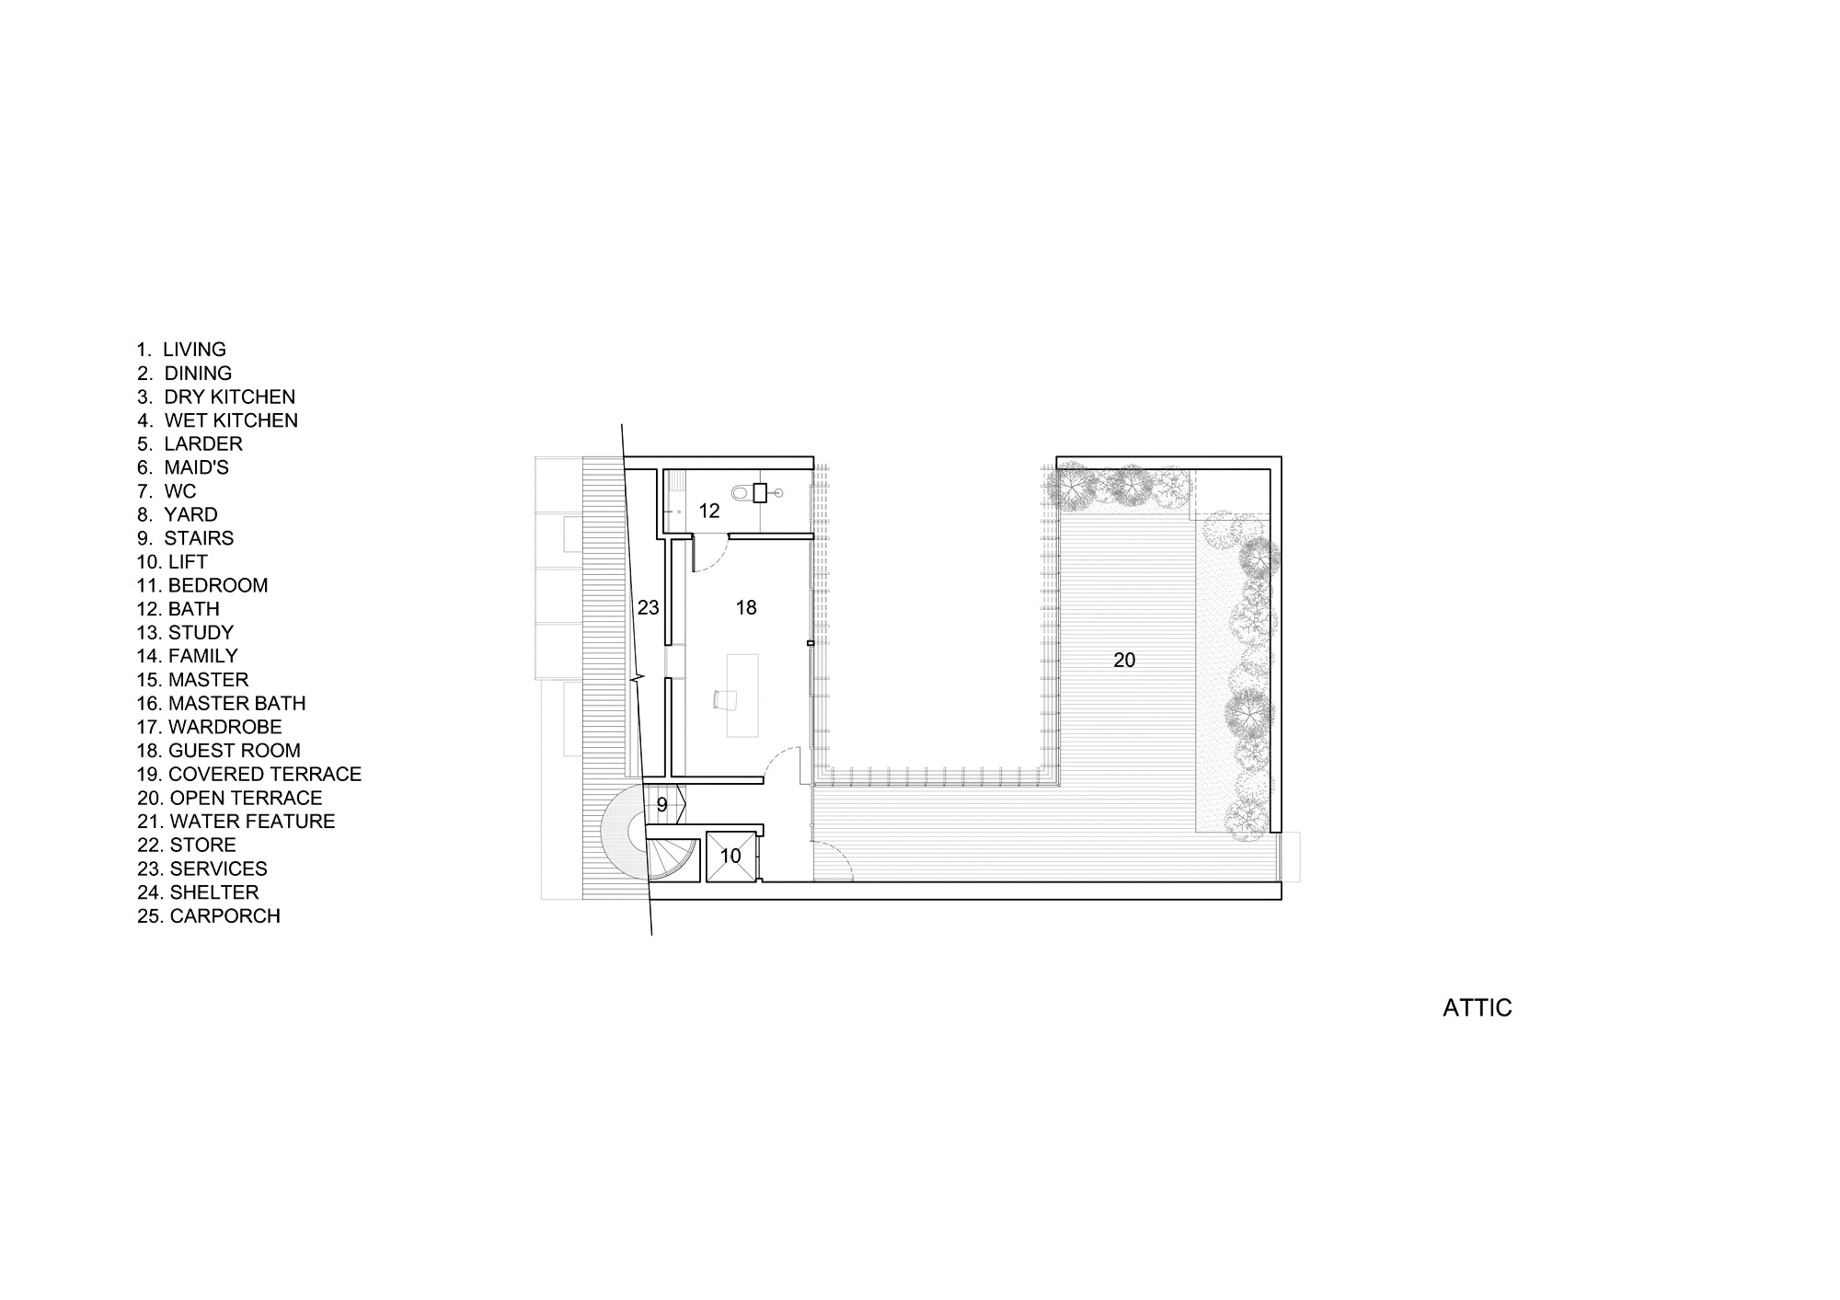 Attic Floor Plan - Vertical Court Luxury Residence - Greenbank Park, Singapore